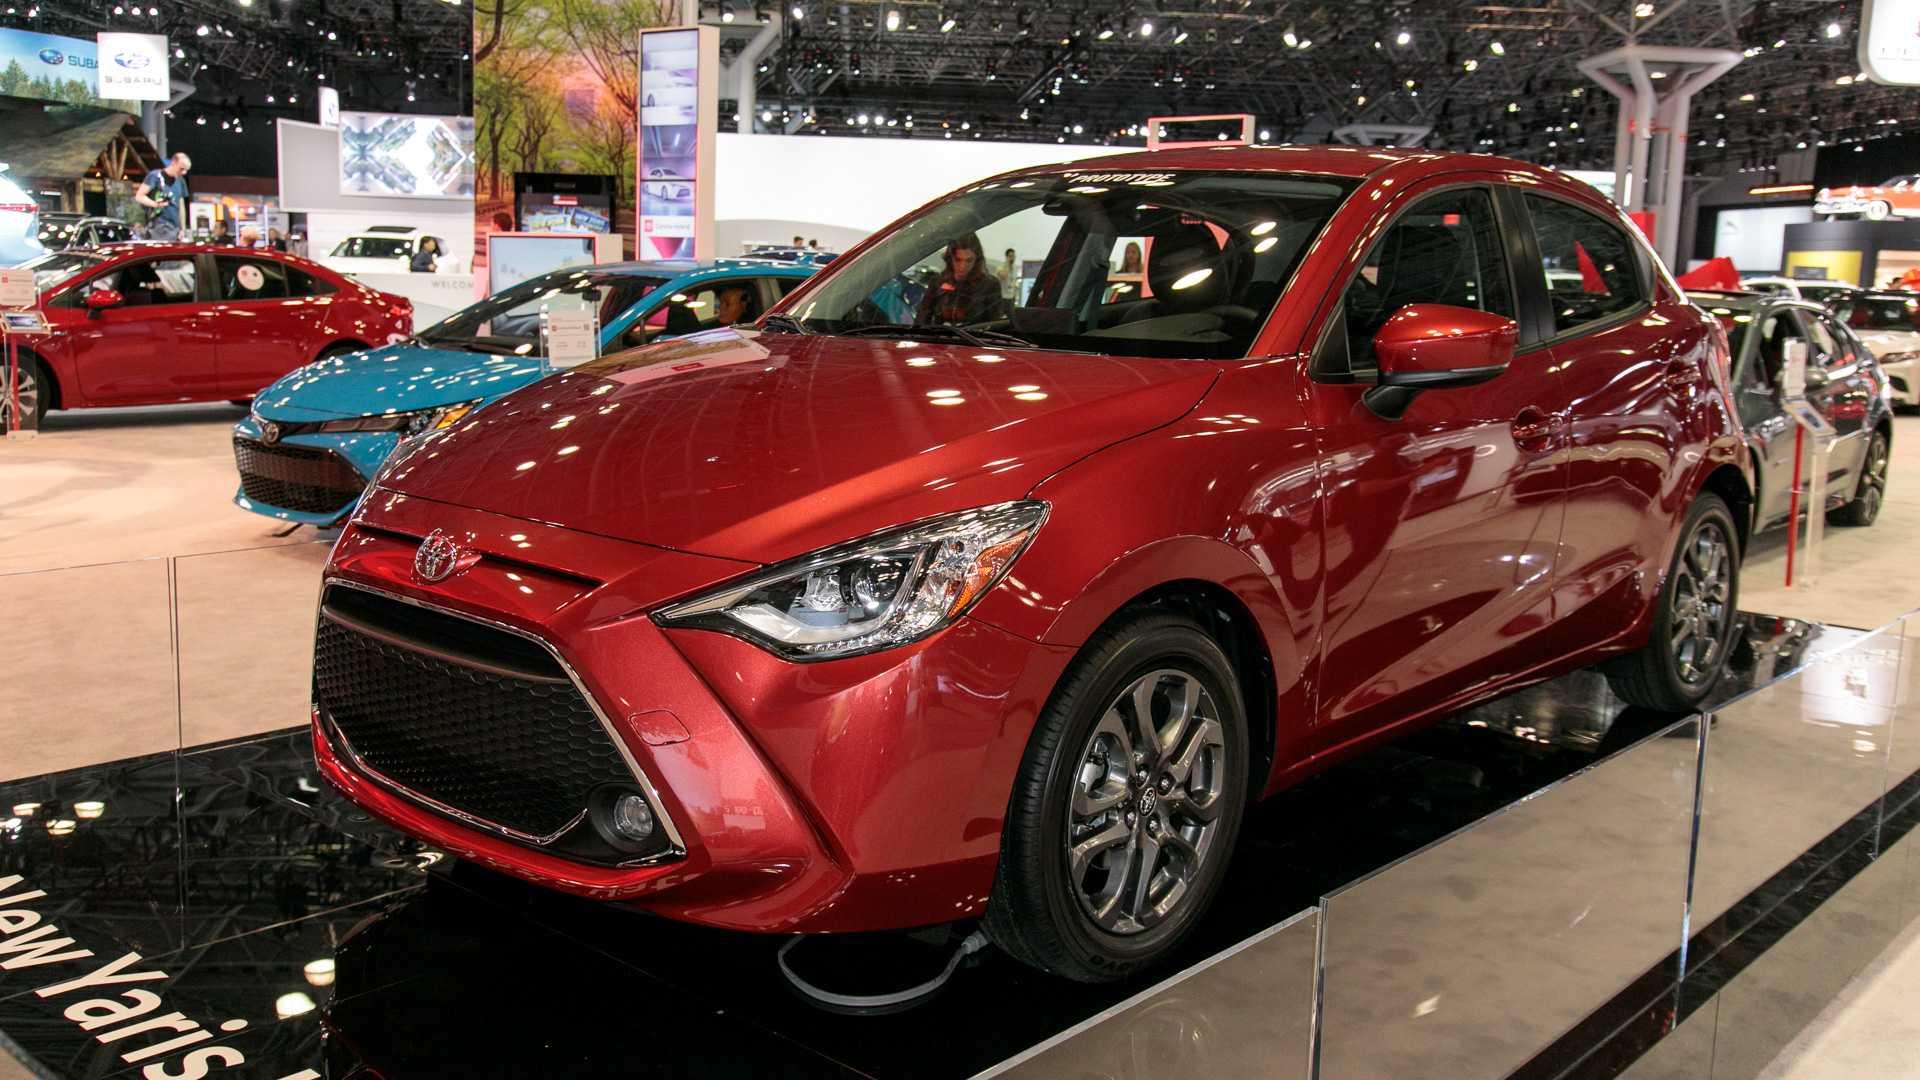 95 Gallery of Yaris 2020 Mazda 2 Images for Yaris 2020 Mazda 2